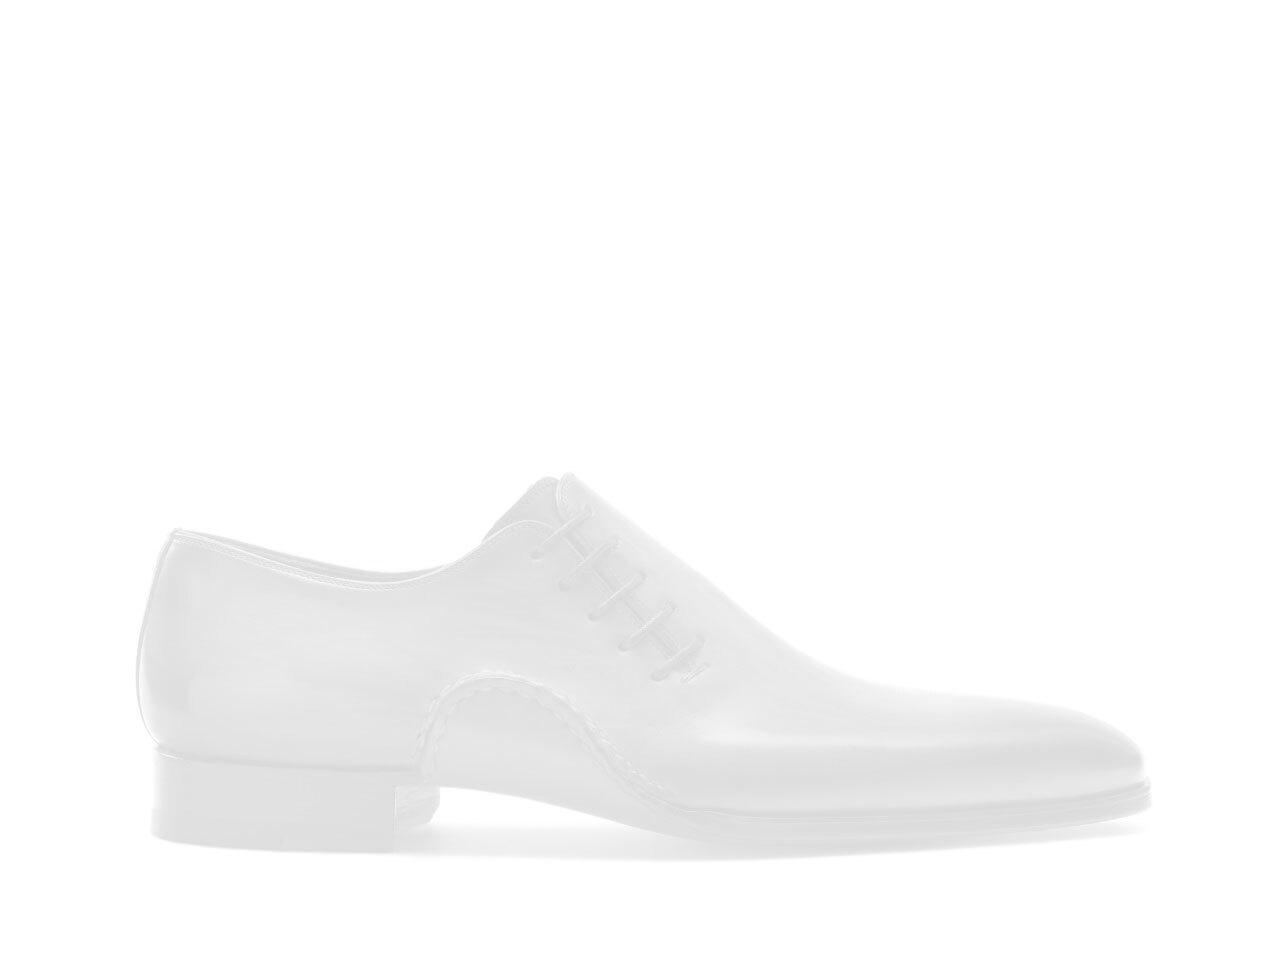 Sole of the Magnanni Estovan Midbrown and Cuero Men's Oxford Shoes